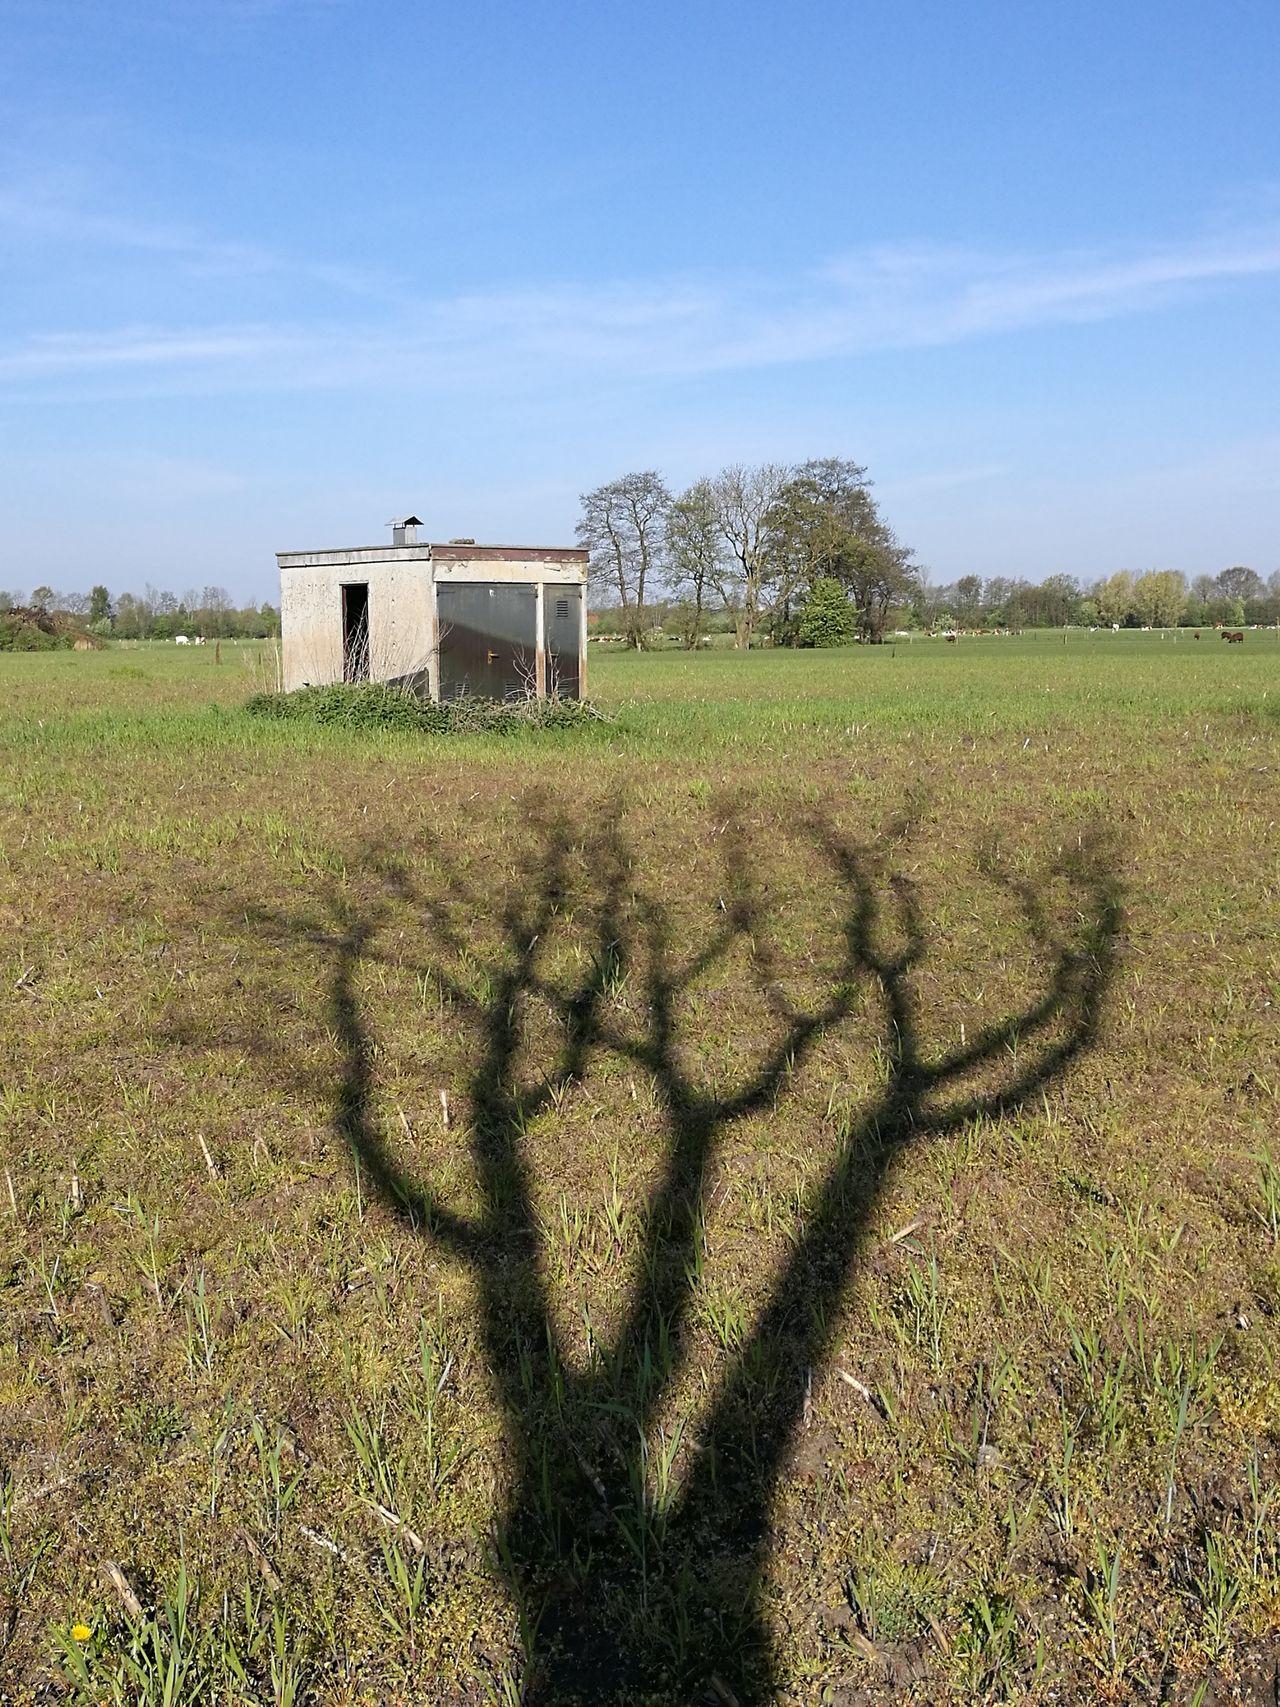 Outdoors Landscape Rural Scene Agriculture Field Uglybuildings